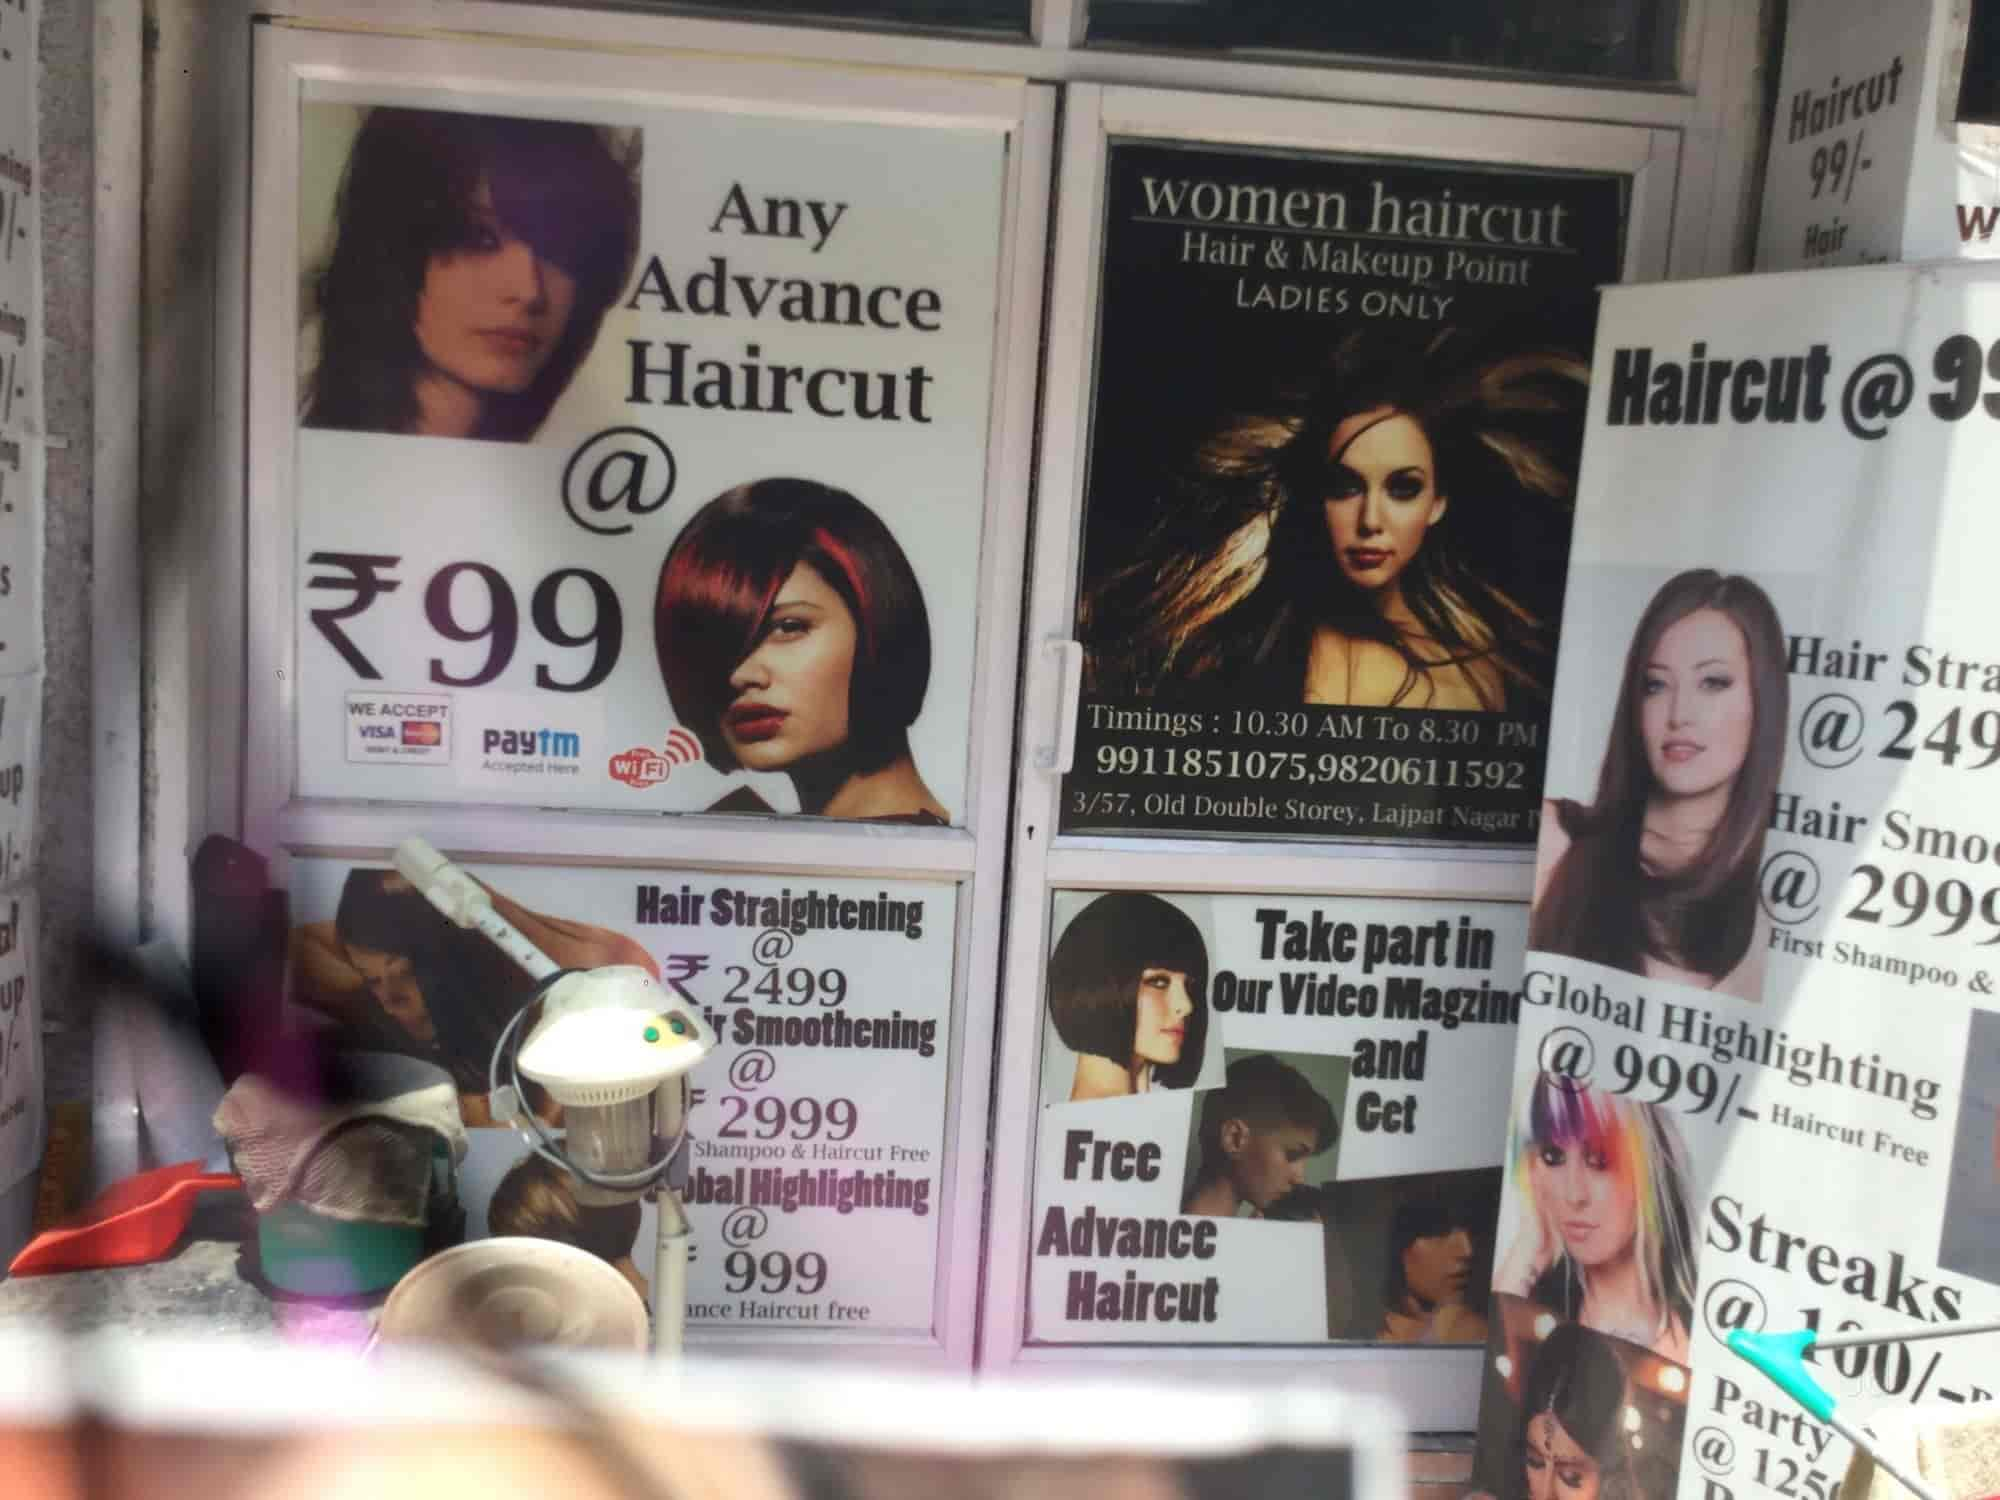 women haircut, lajpat nagar 4 - beauty parlours in delhi - justdial